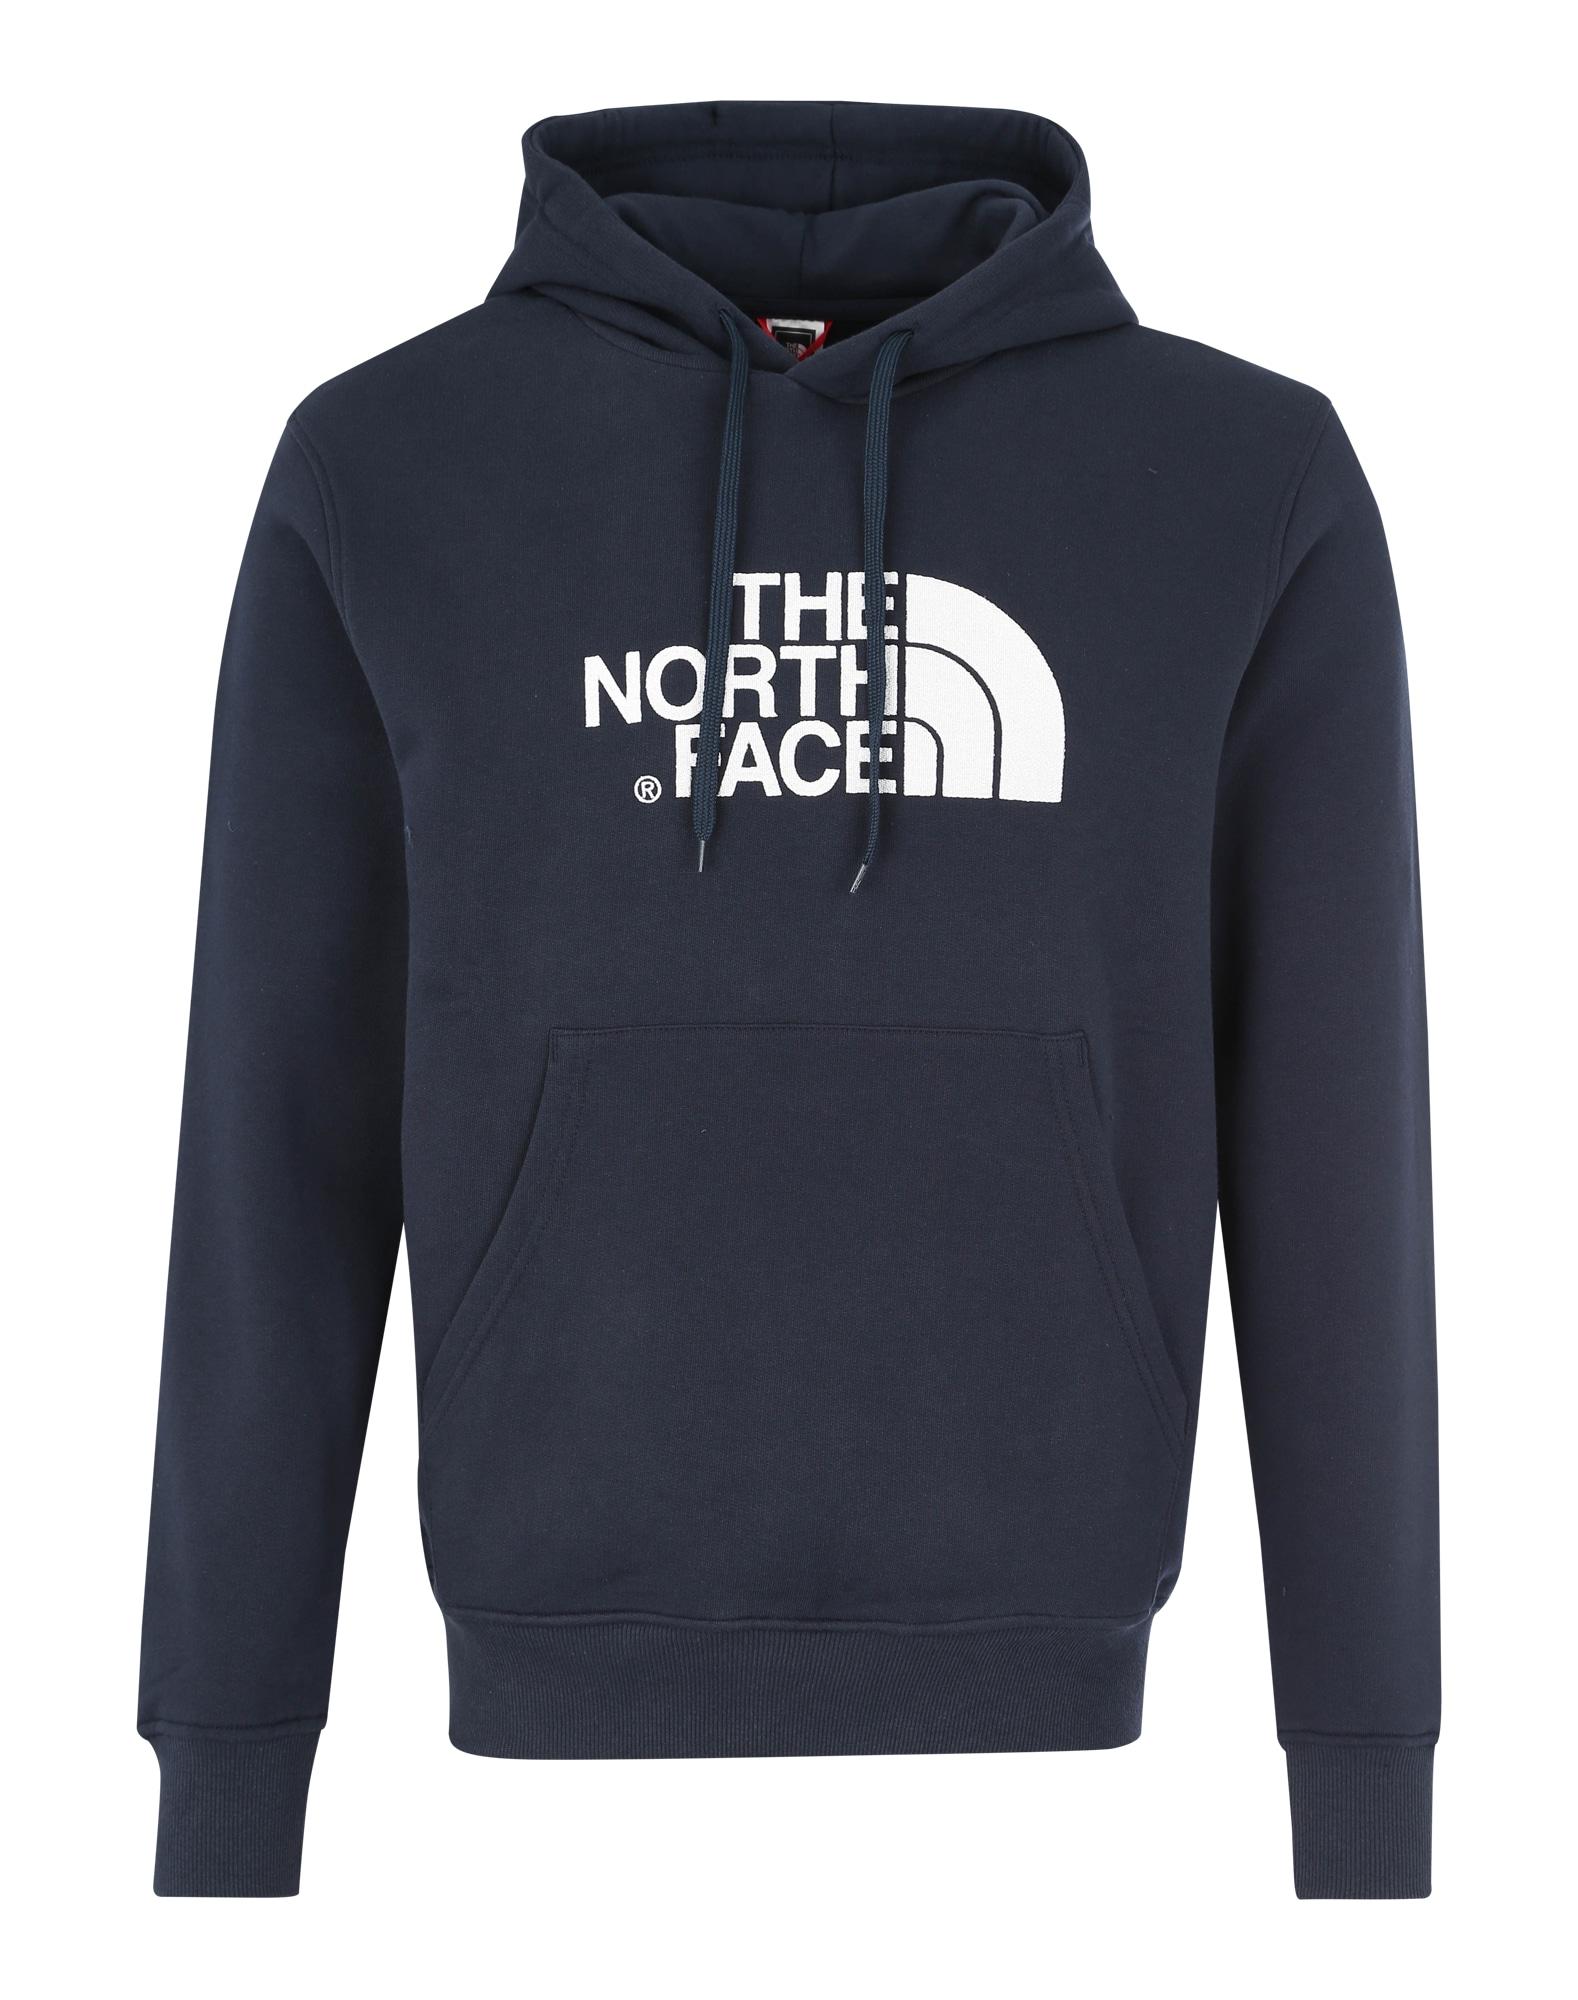 THE NORTH FACE Heren Sweatshirt donkerblauw wit